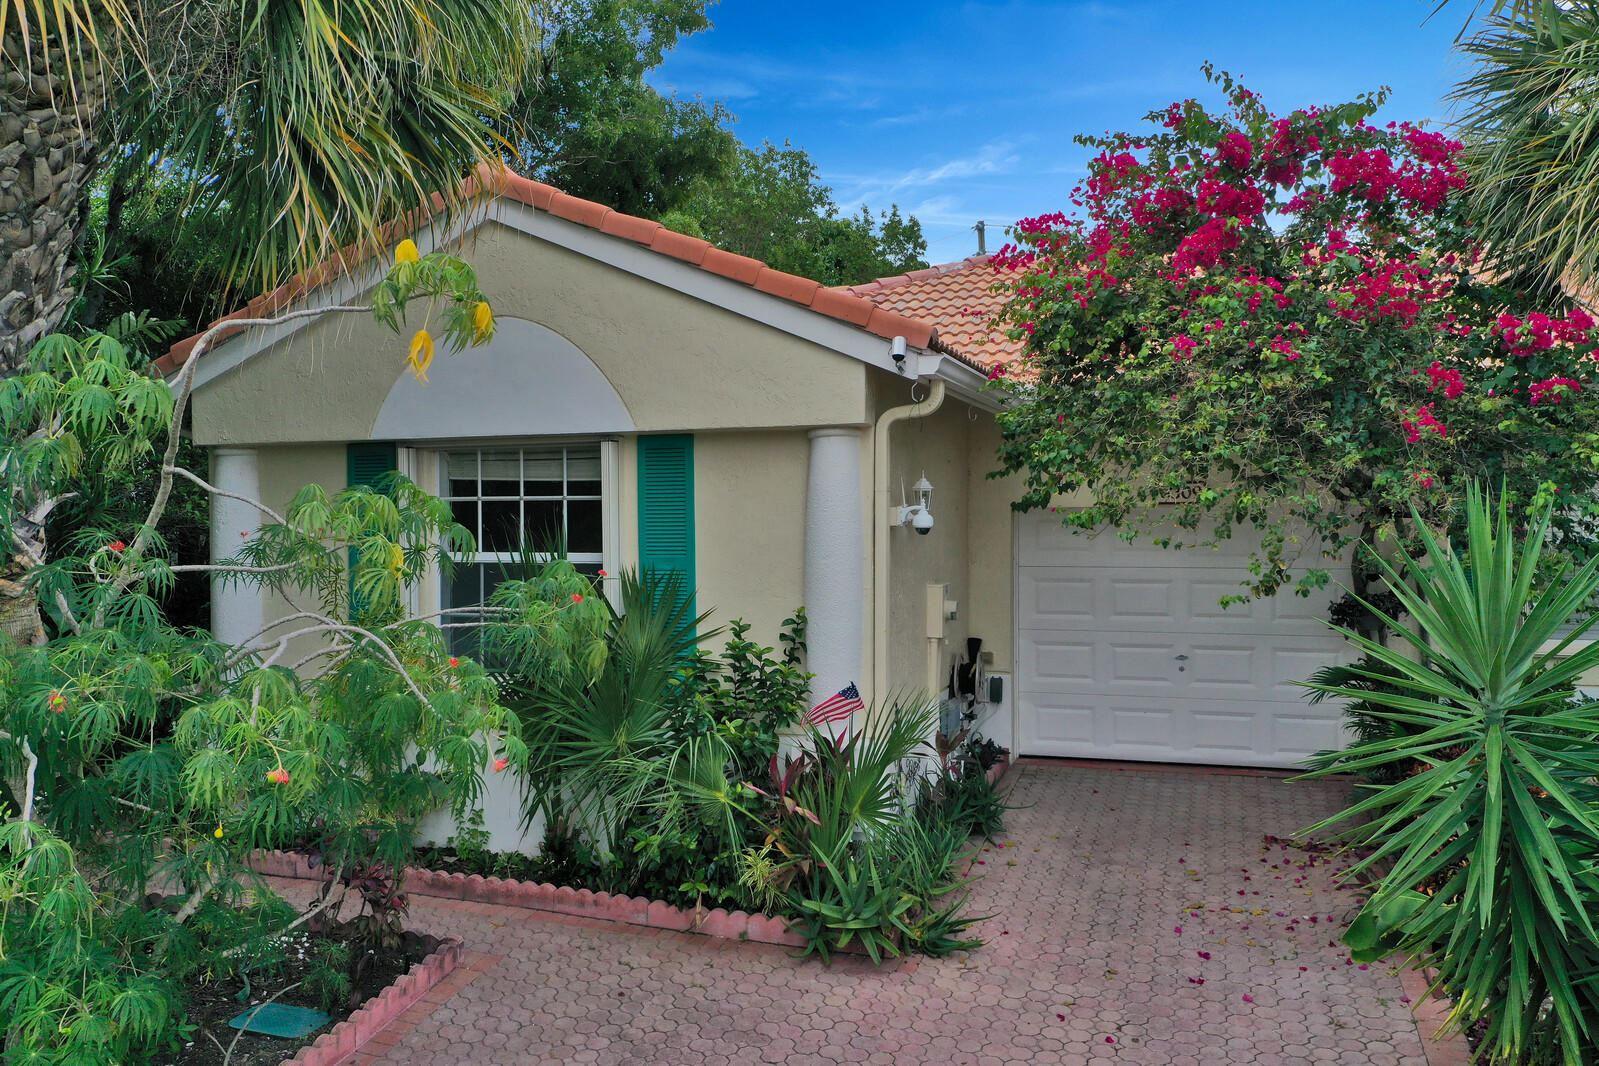 6309 Petunia Road, Delray Beach, FL 33484 - MLS#: RX-10620774